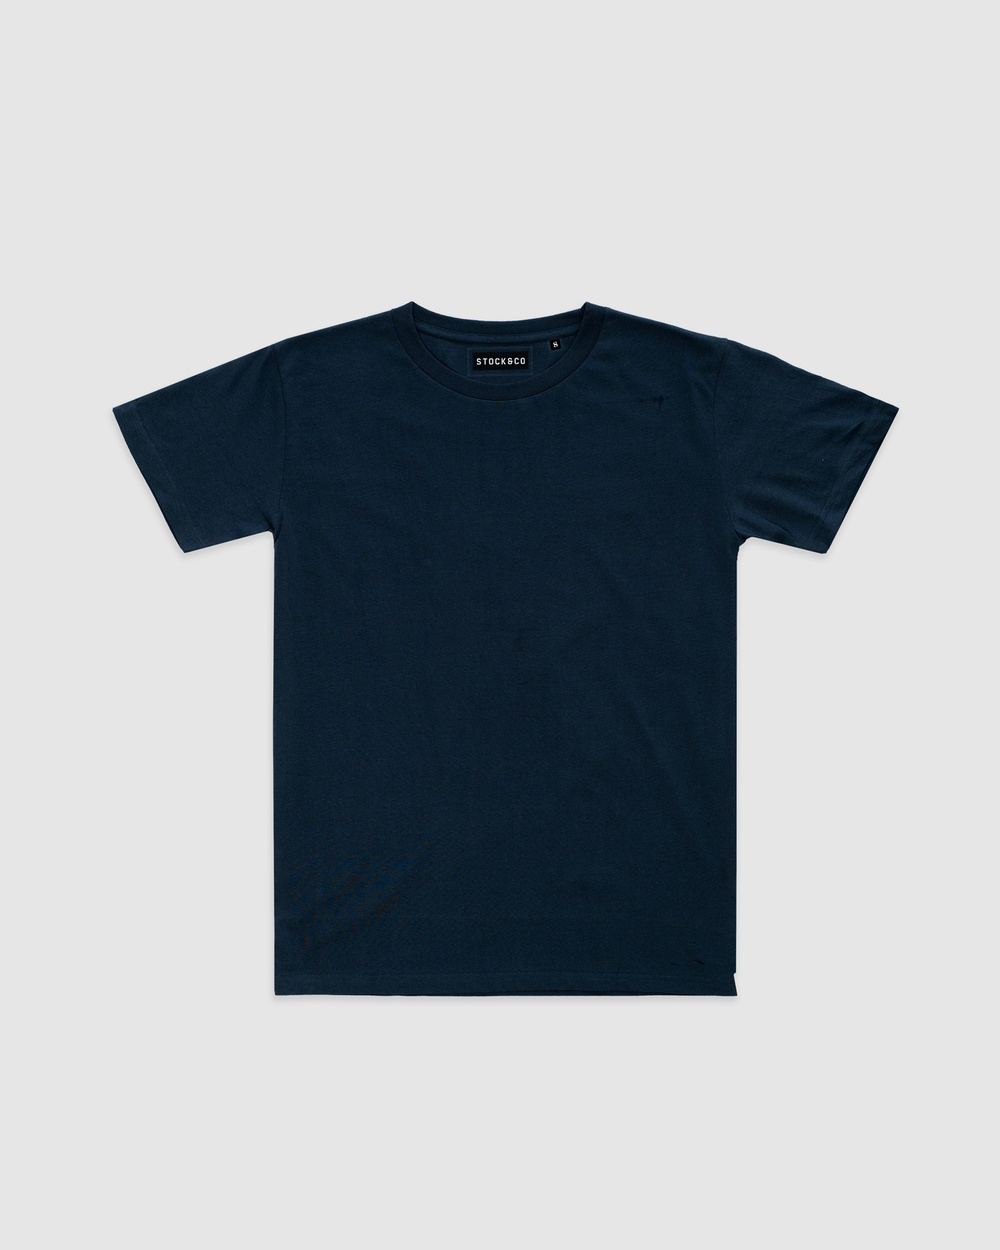 Stock & Co. - Stock Tee   Kids - T-Shirts & Singlets (NAVY) Stock Tee - Kids